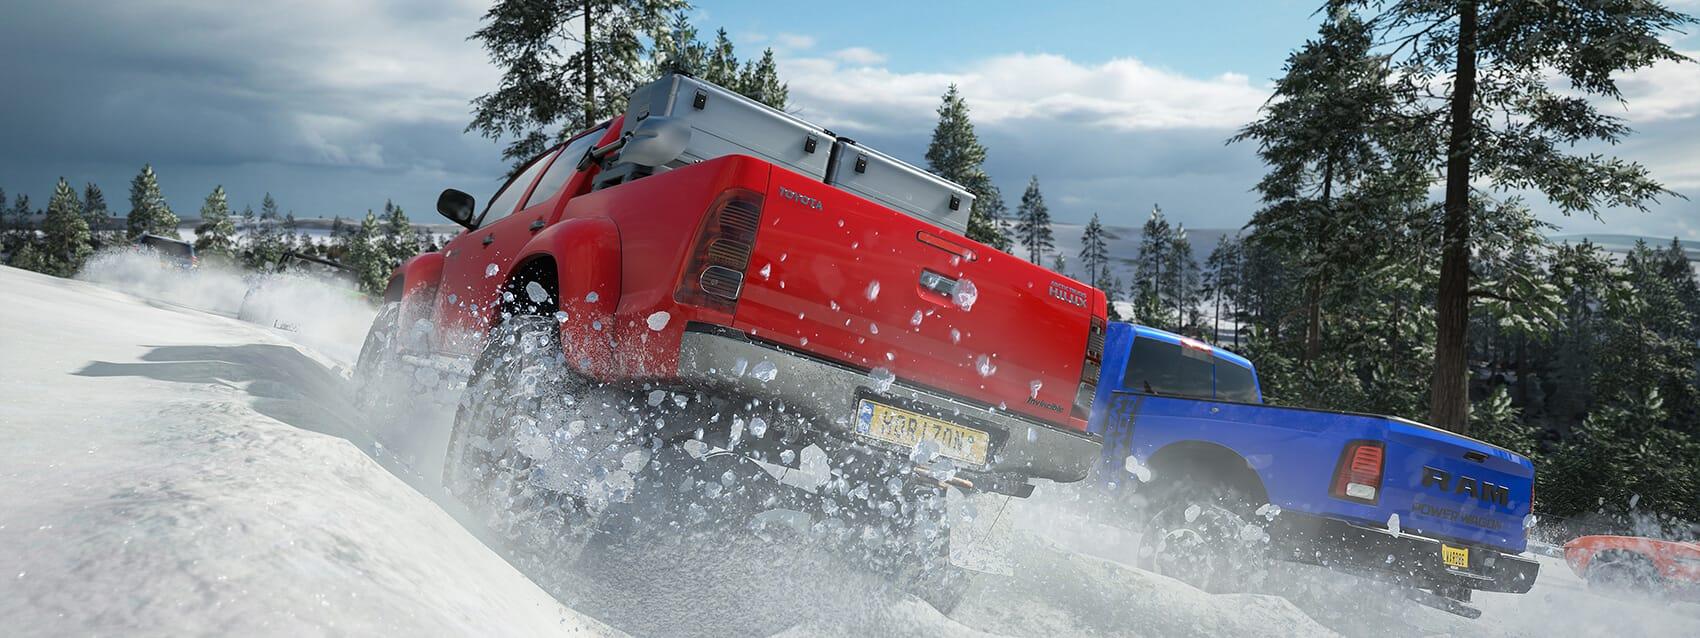 Forza Horizon 4 seizoenen